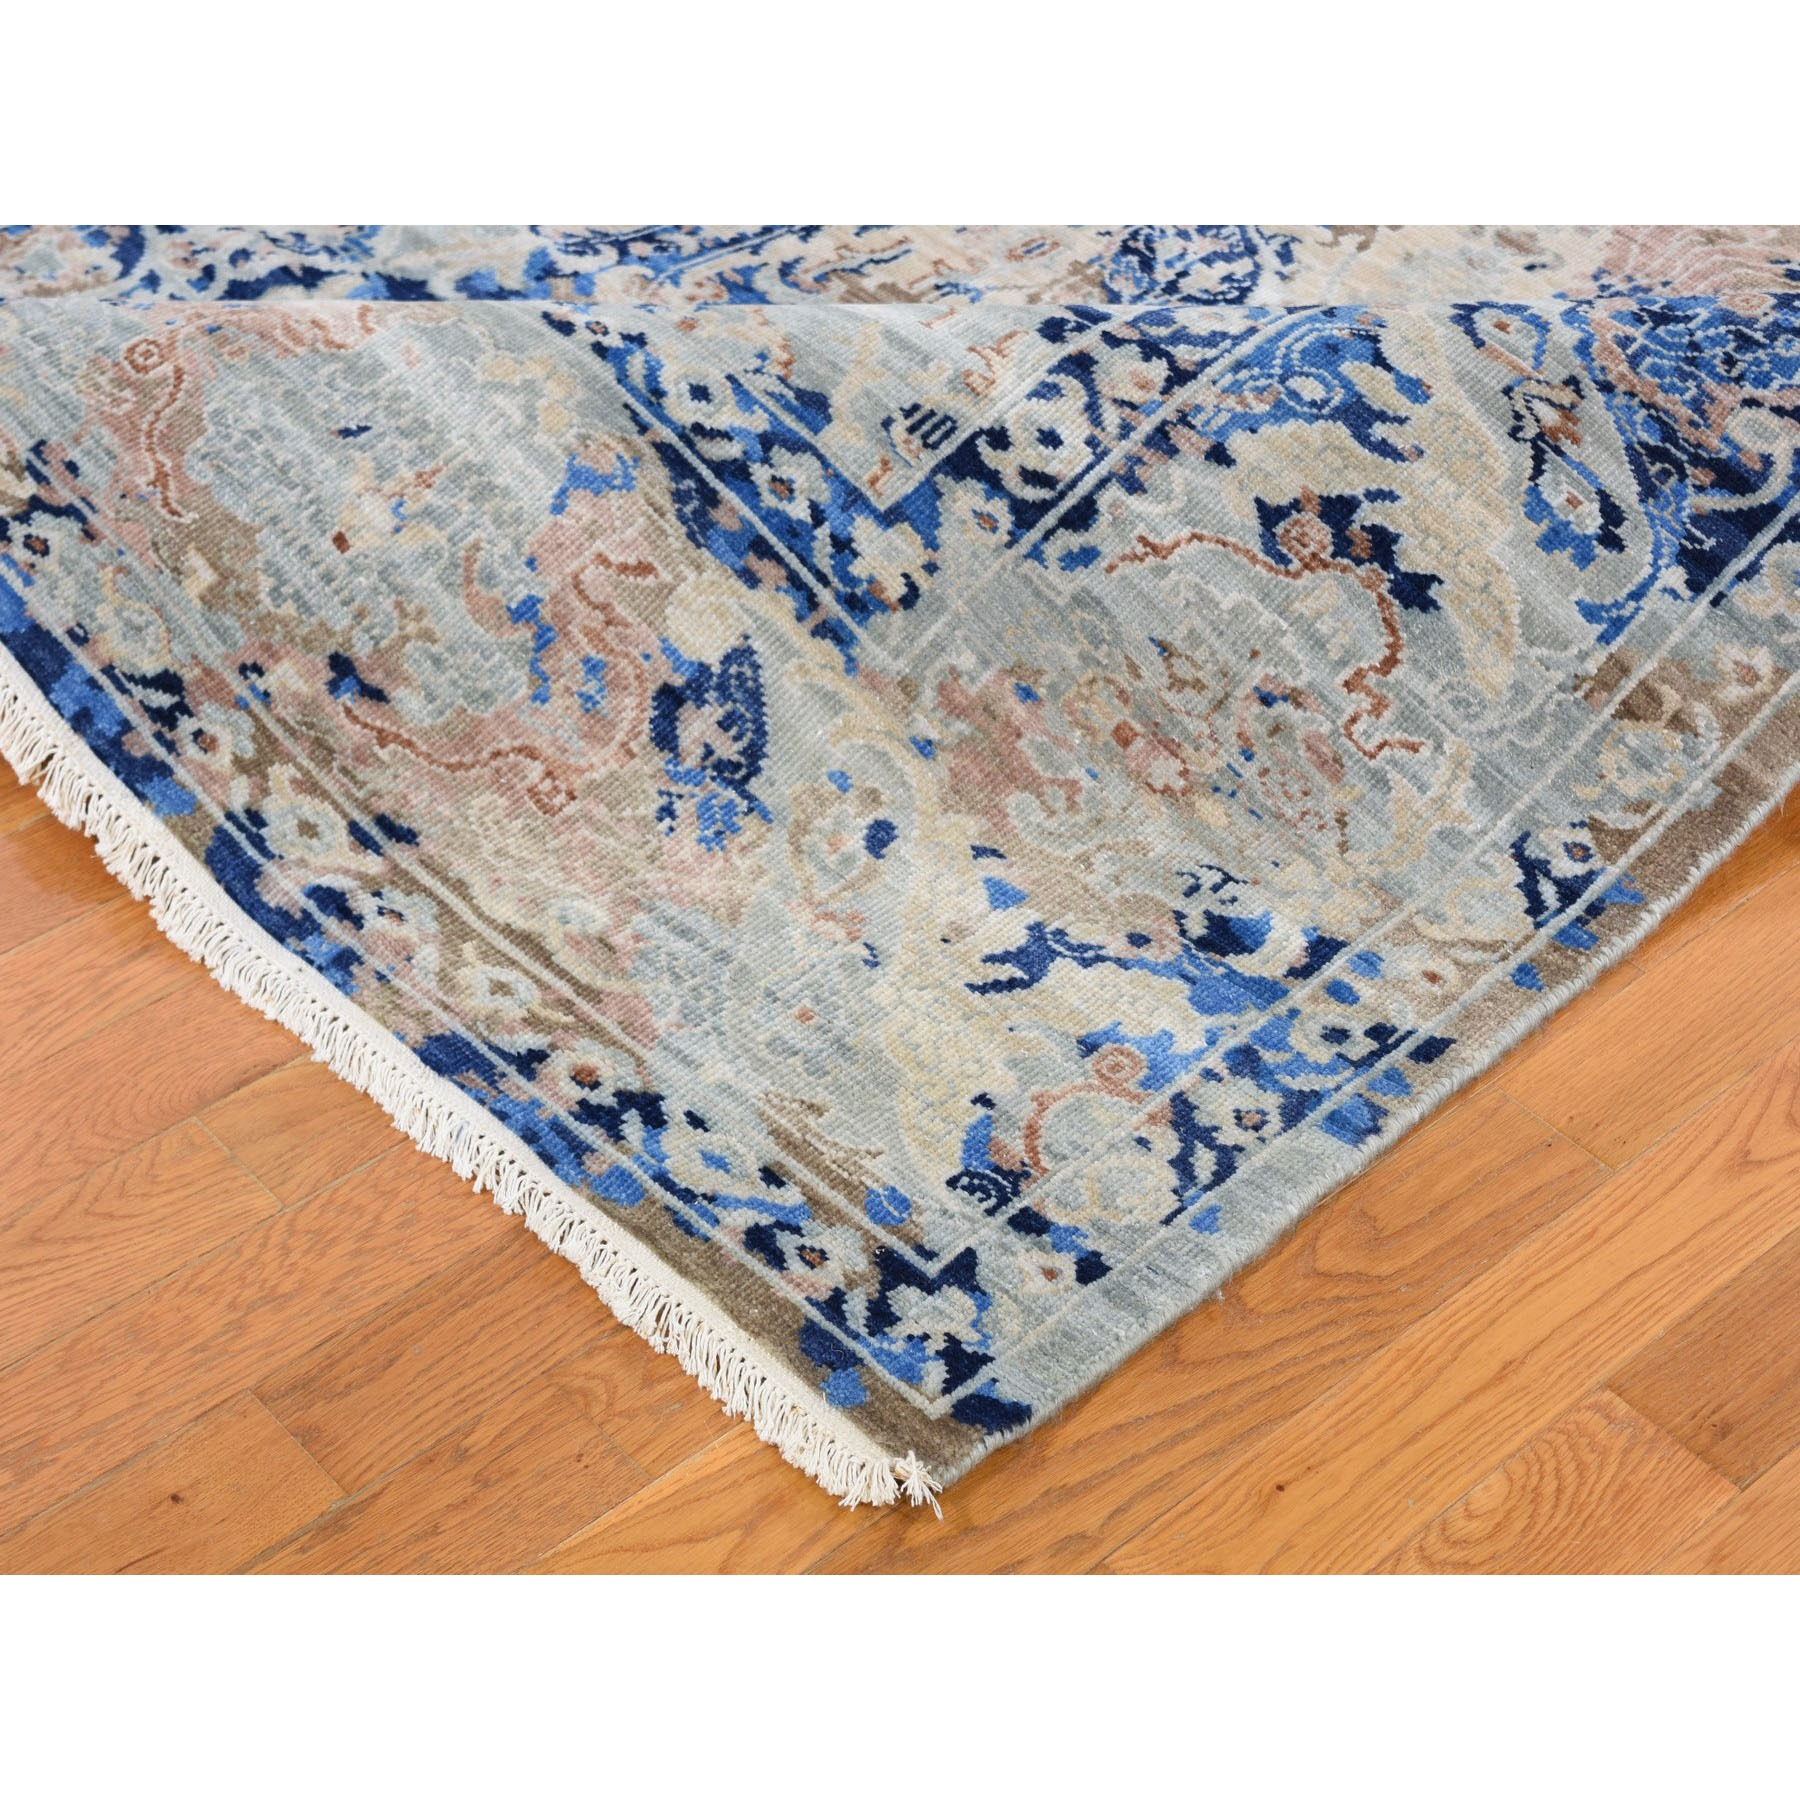 "9'x11'10"" Denim Blue Transitional Mughal Design Hand Knotted Oriental Rug"